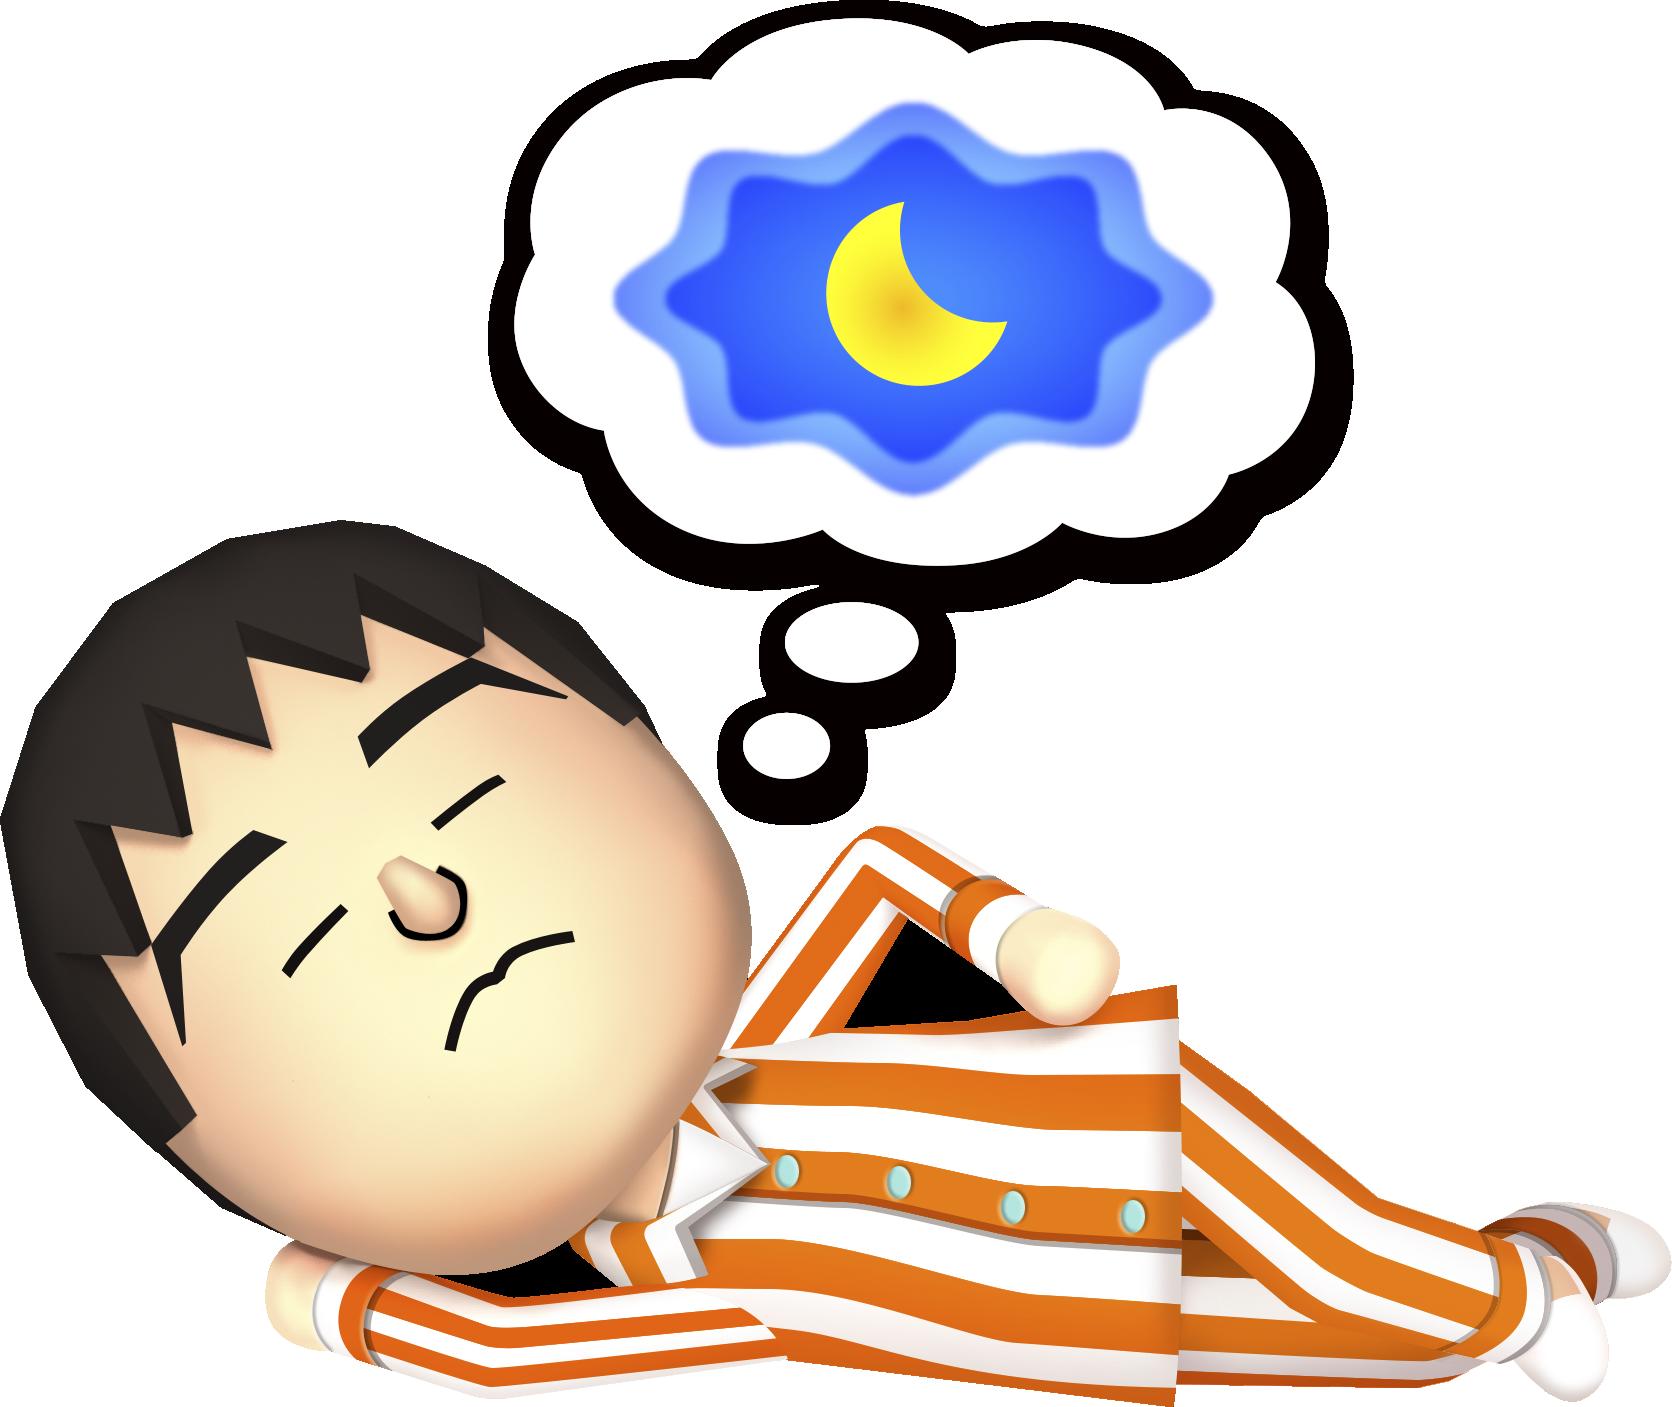 Dreaming Mii